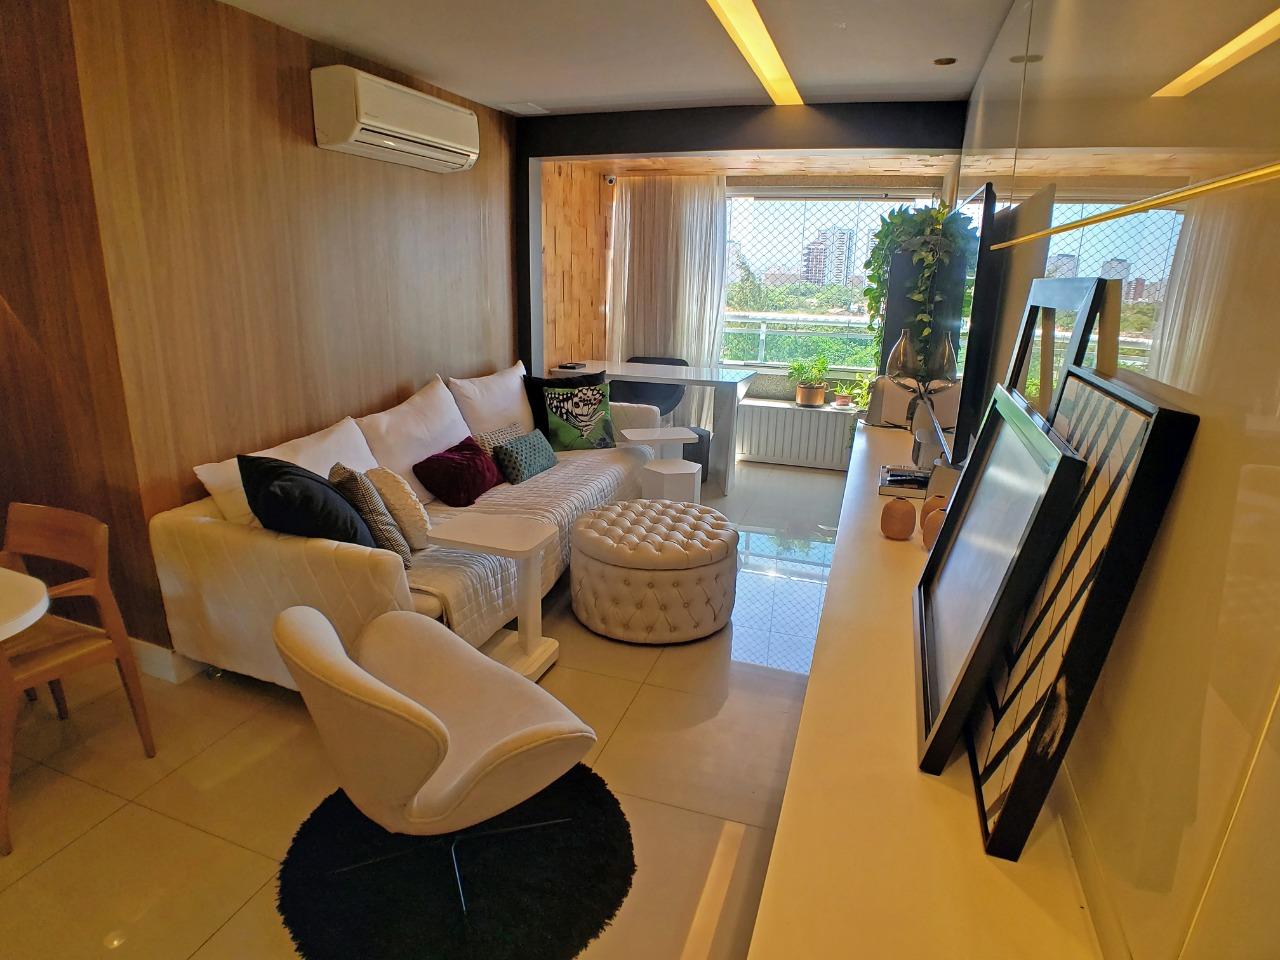 Apartamento com 03 Suítes no Luciano Cavalcante